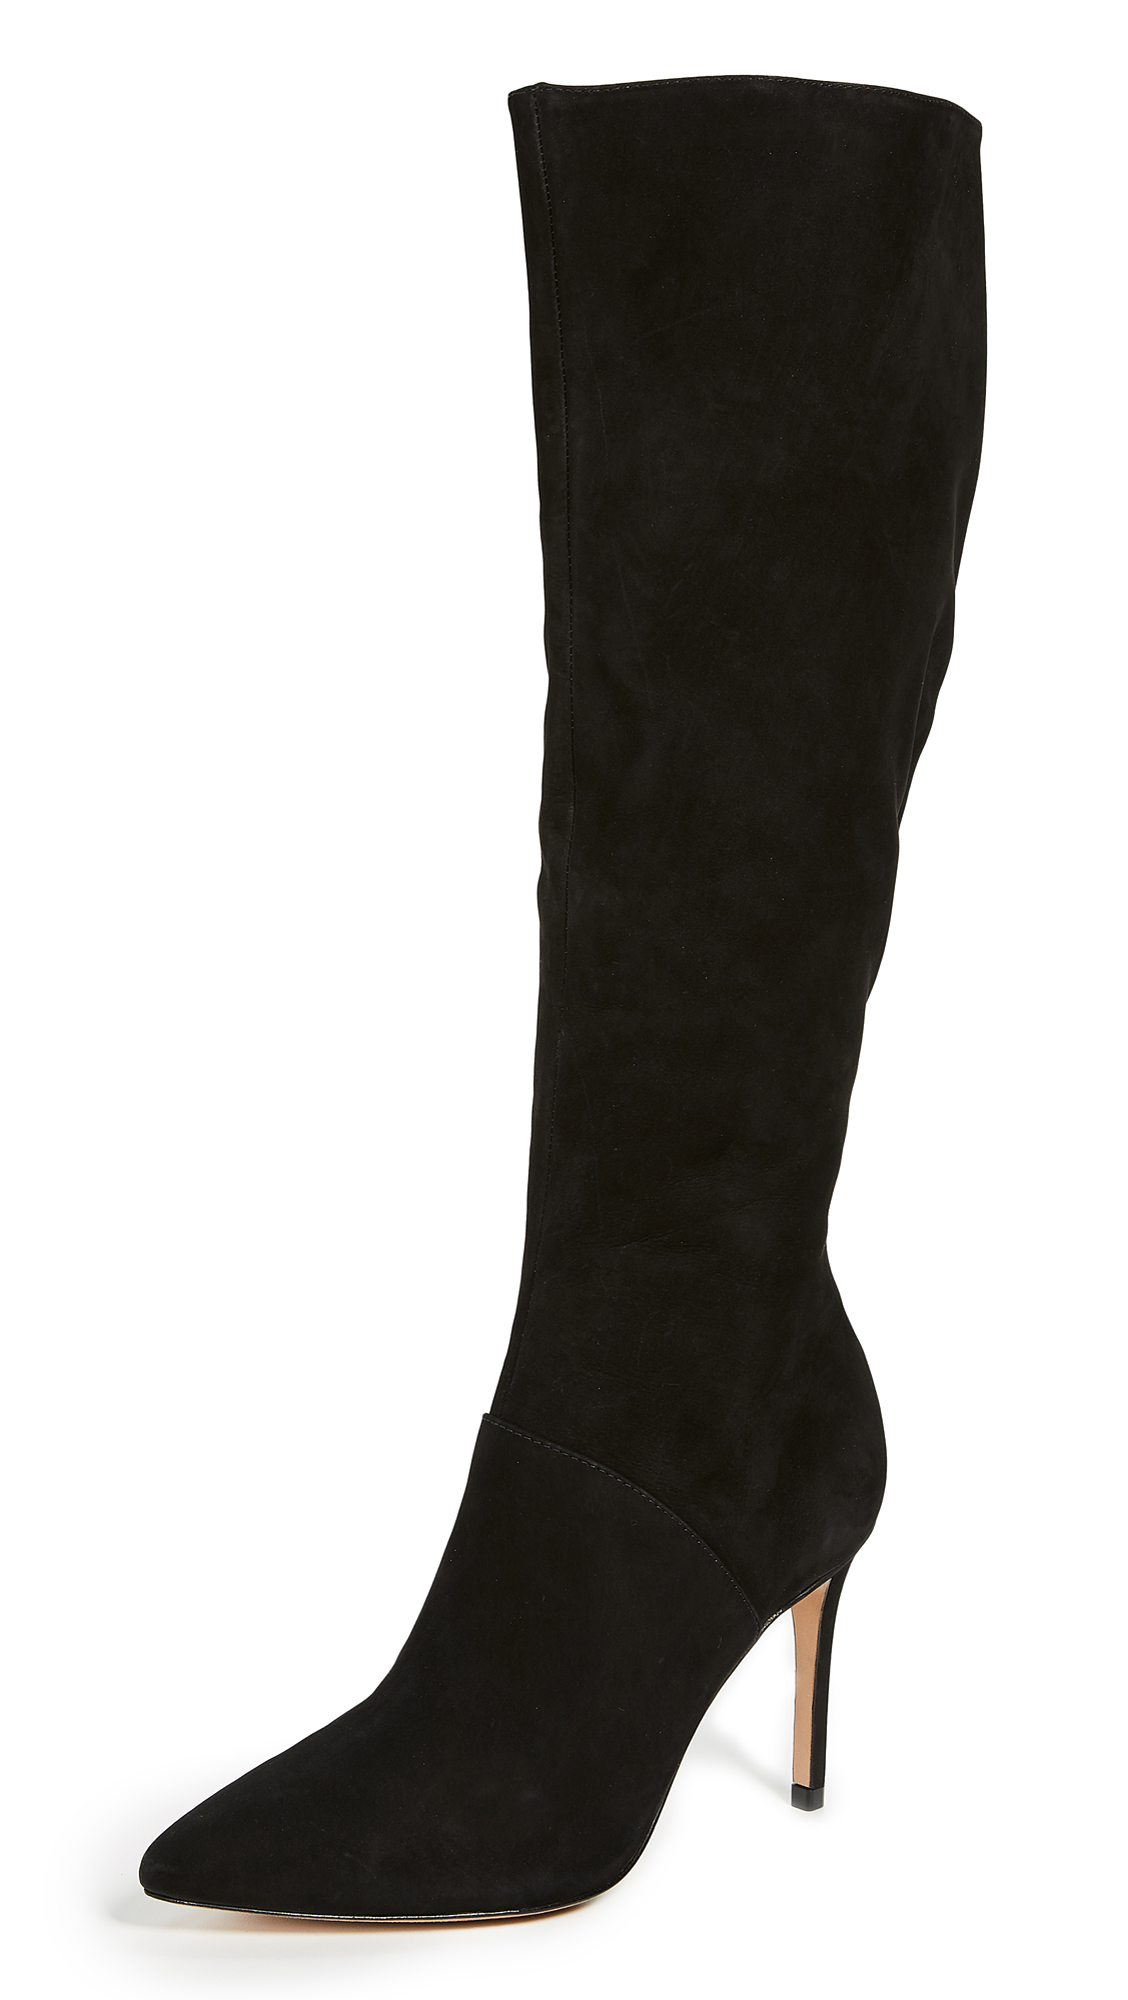 Schutz Eullalia Tall Boots - Black